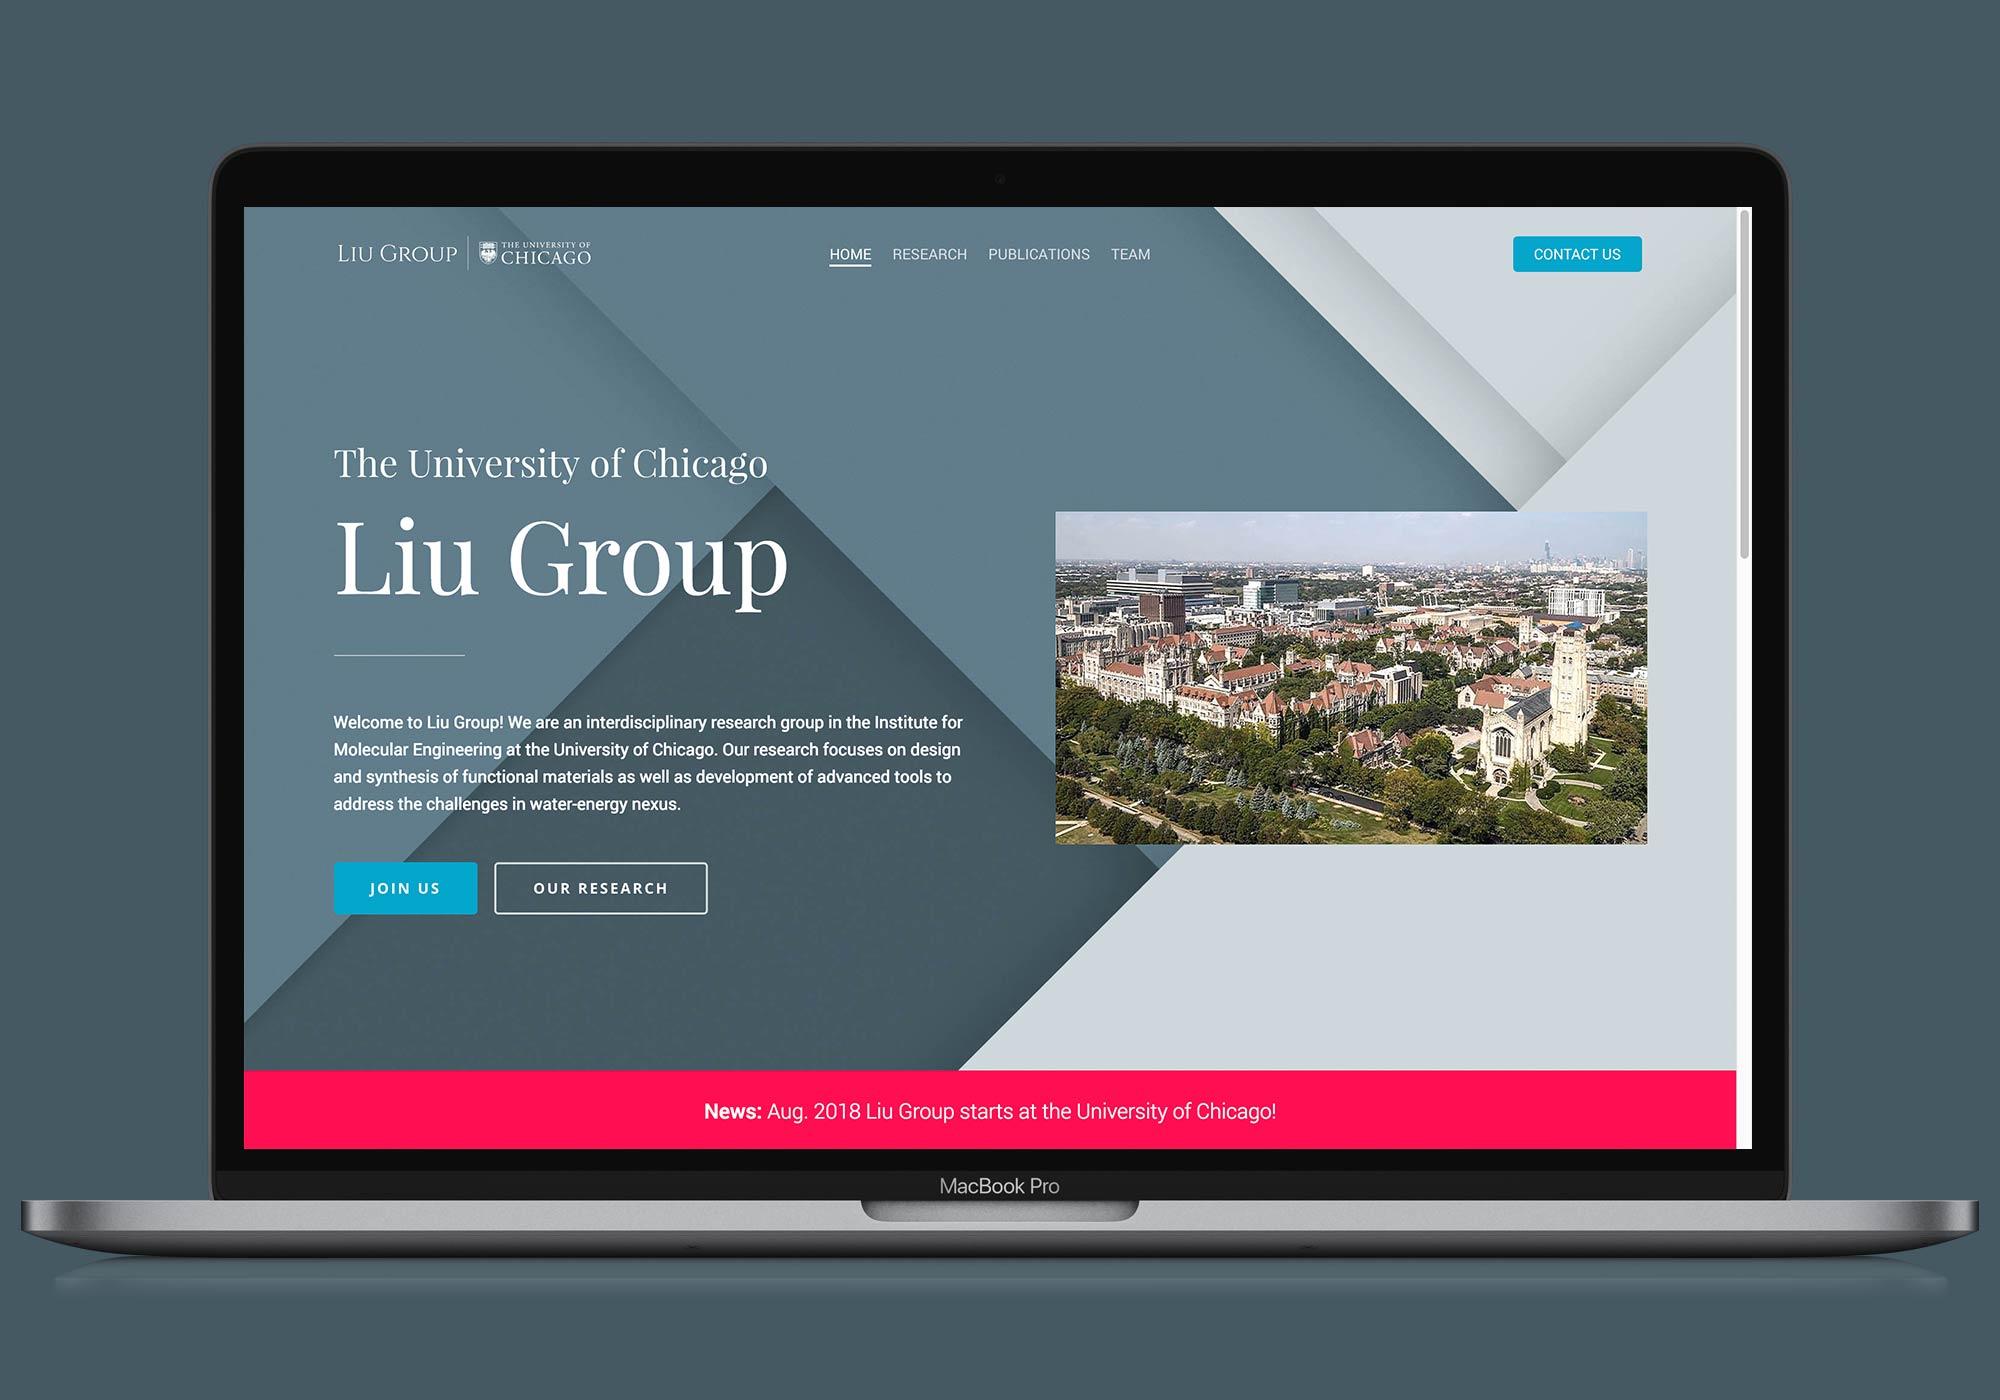 Liu Group – The University of Chicago 官方網站